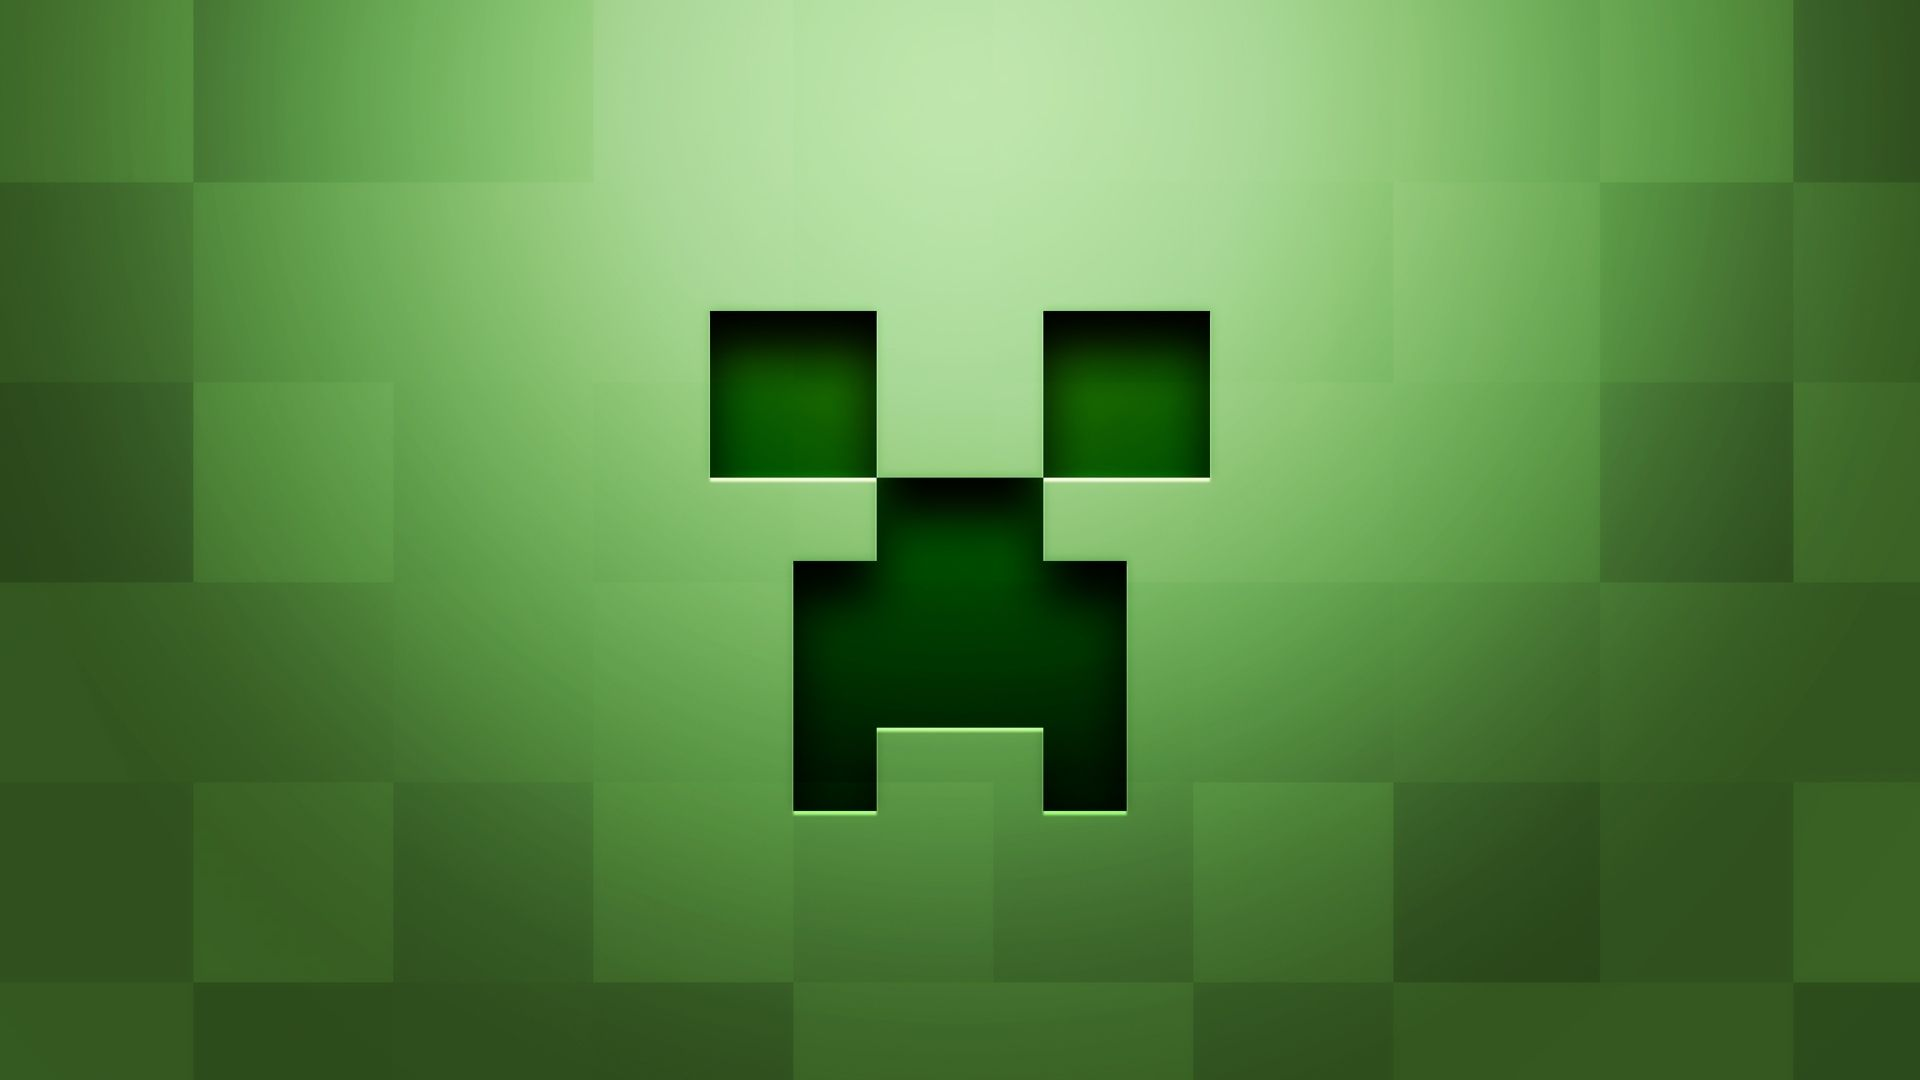 1920x1080 Resultado de imagen para fondos minecraft hd | Minecraft | Pinterest ...